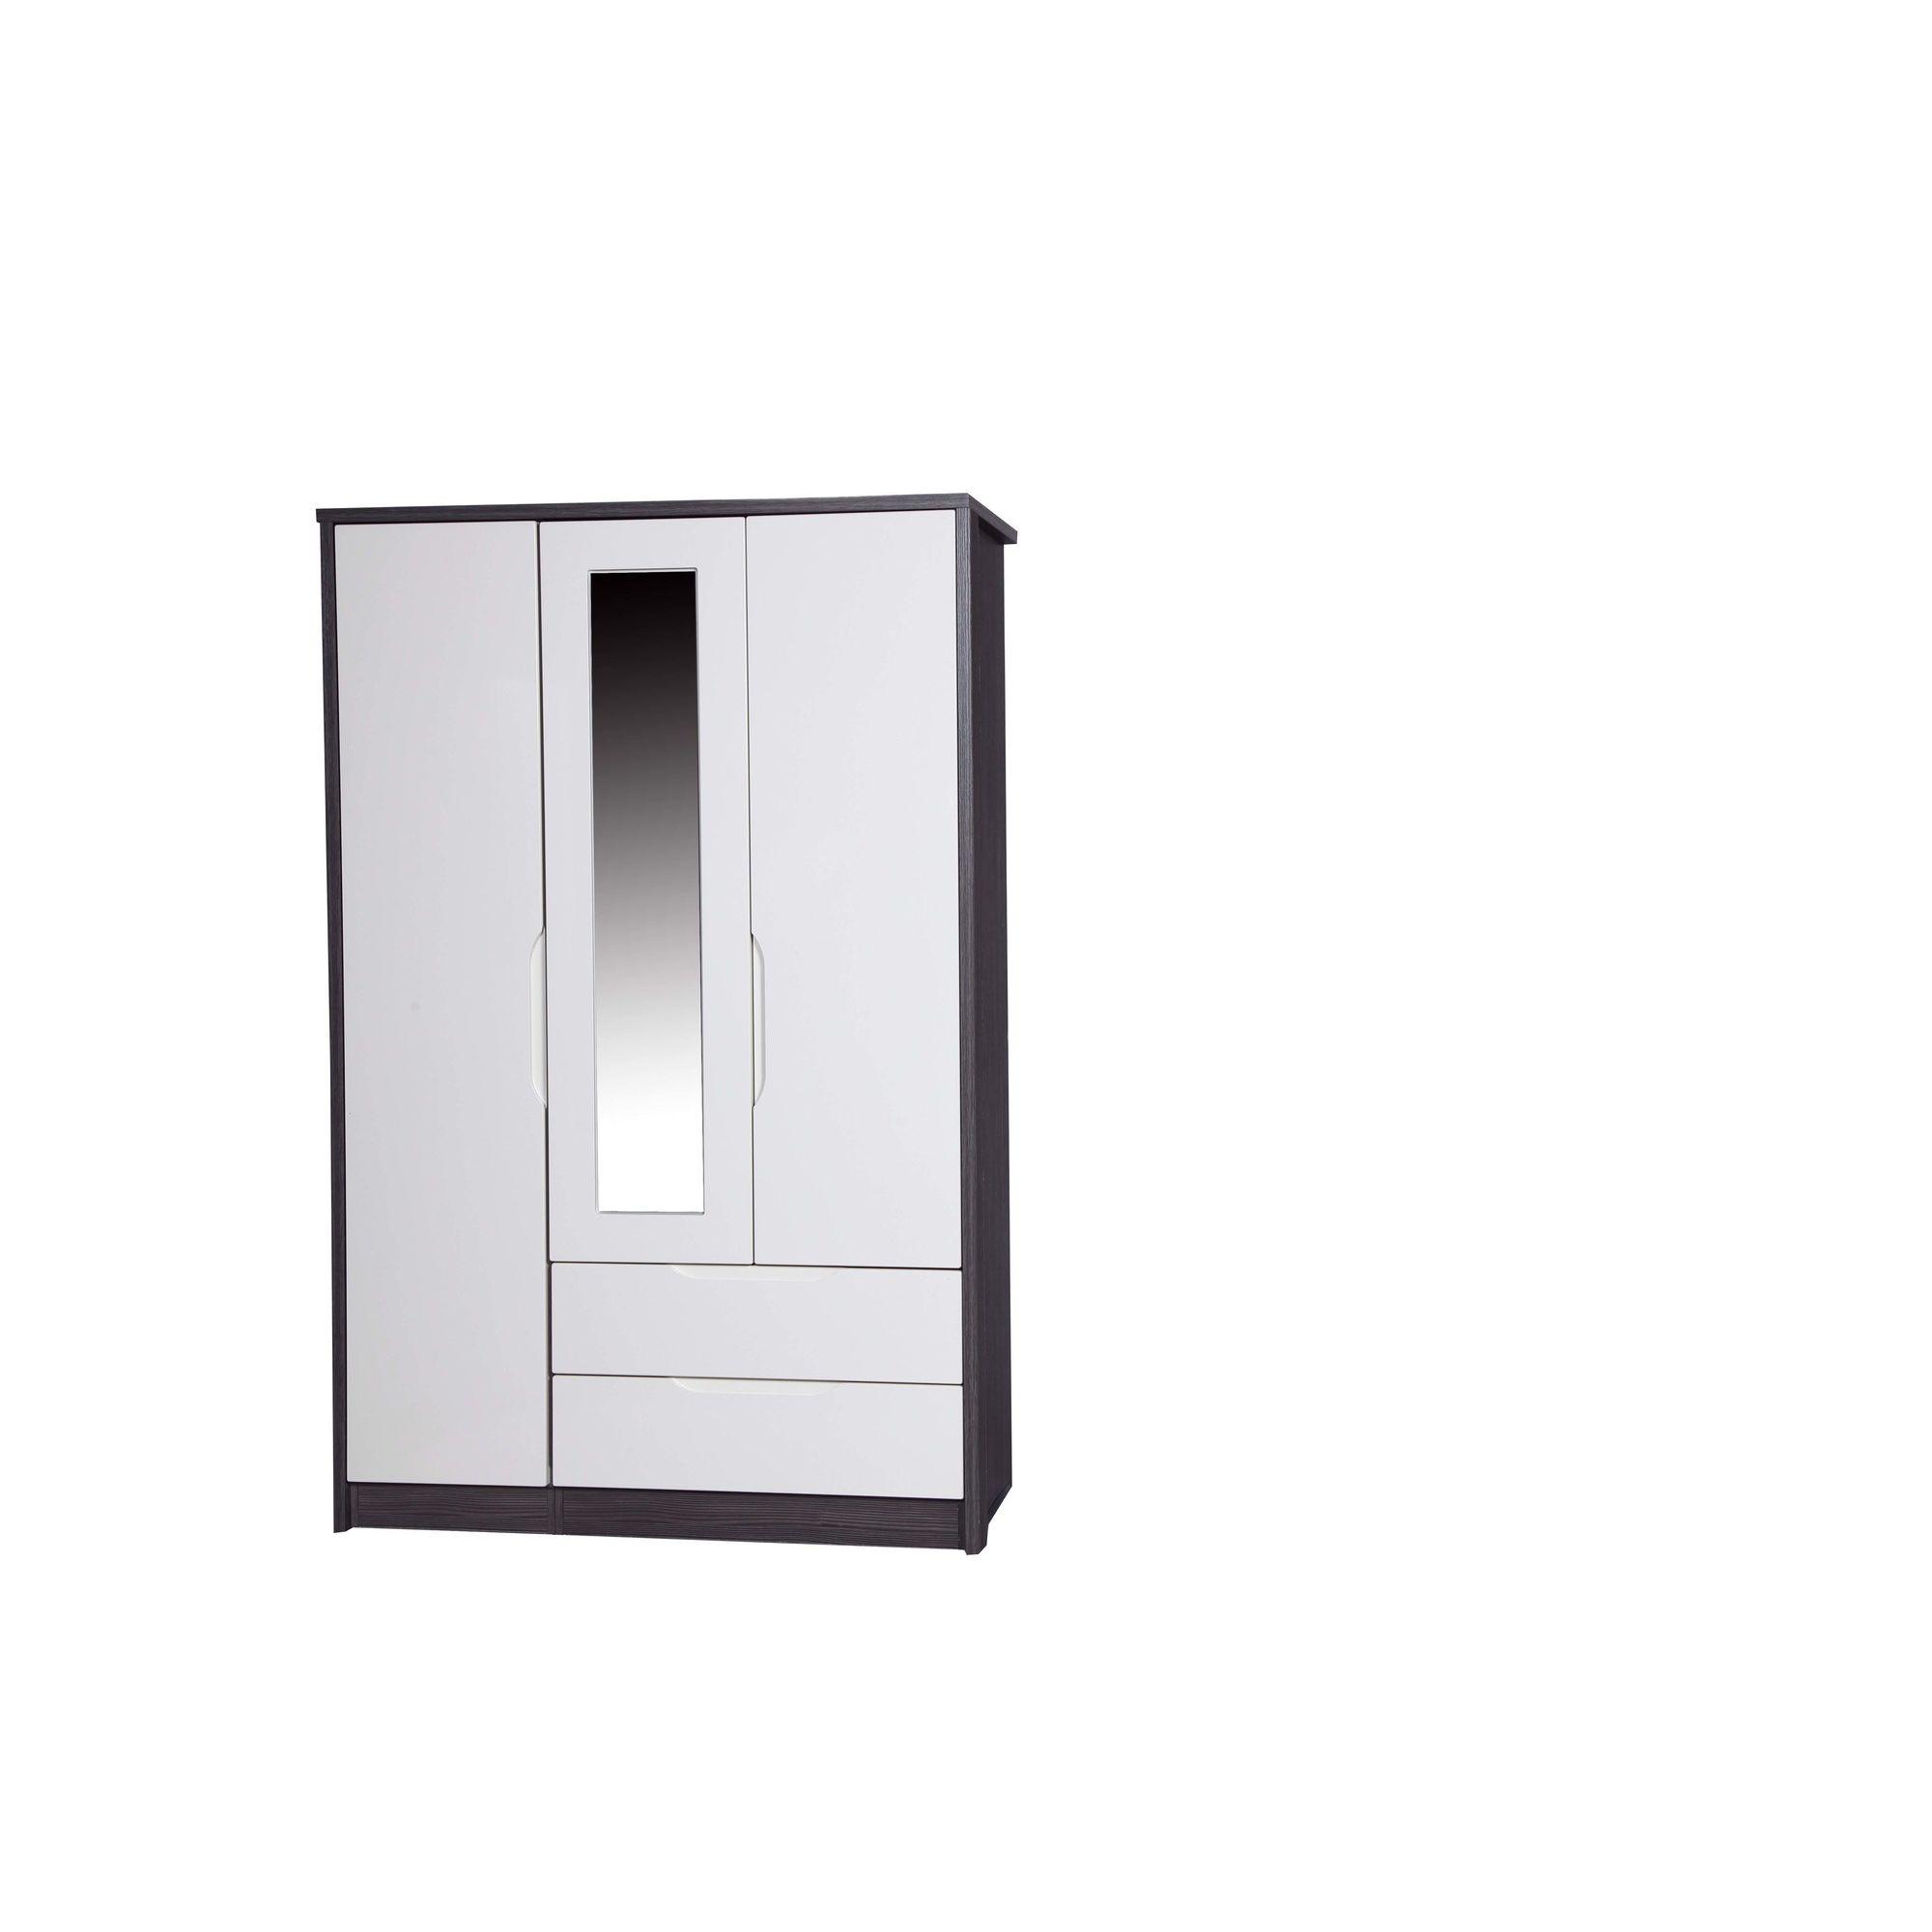 Alto Furniture Avola 3 Door Combi Wardrobe with Mirror - Grey Avola Carcass With Cream Gloss at Tesco Direct